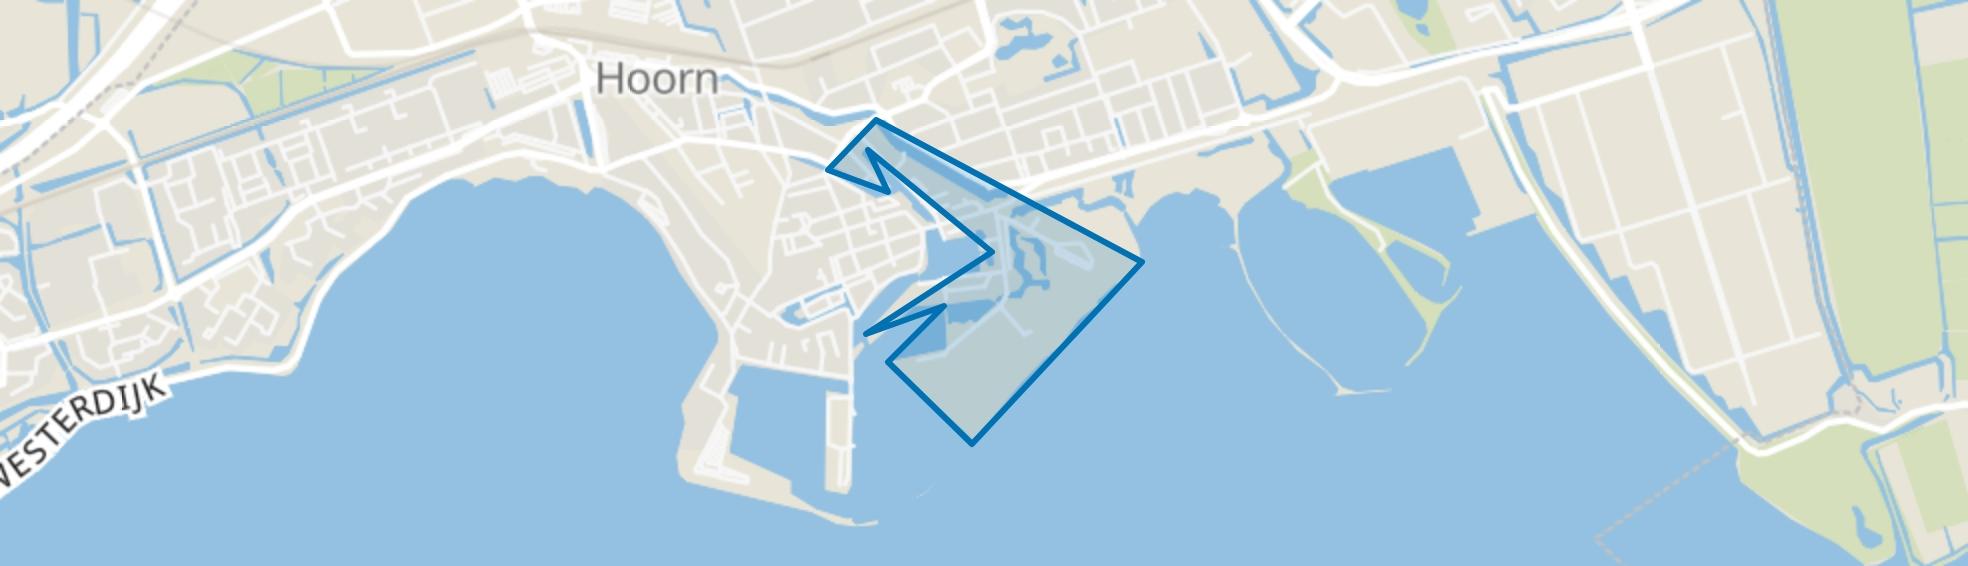 Binnenstad - Buurt 10 00, Hoorn (NH) map